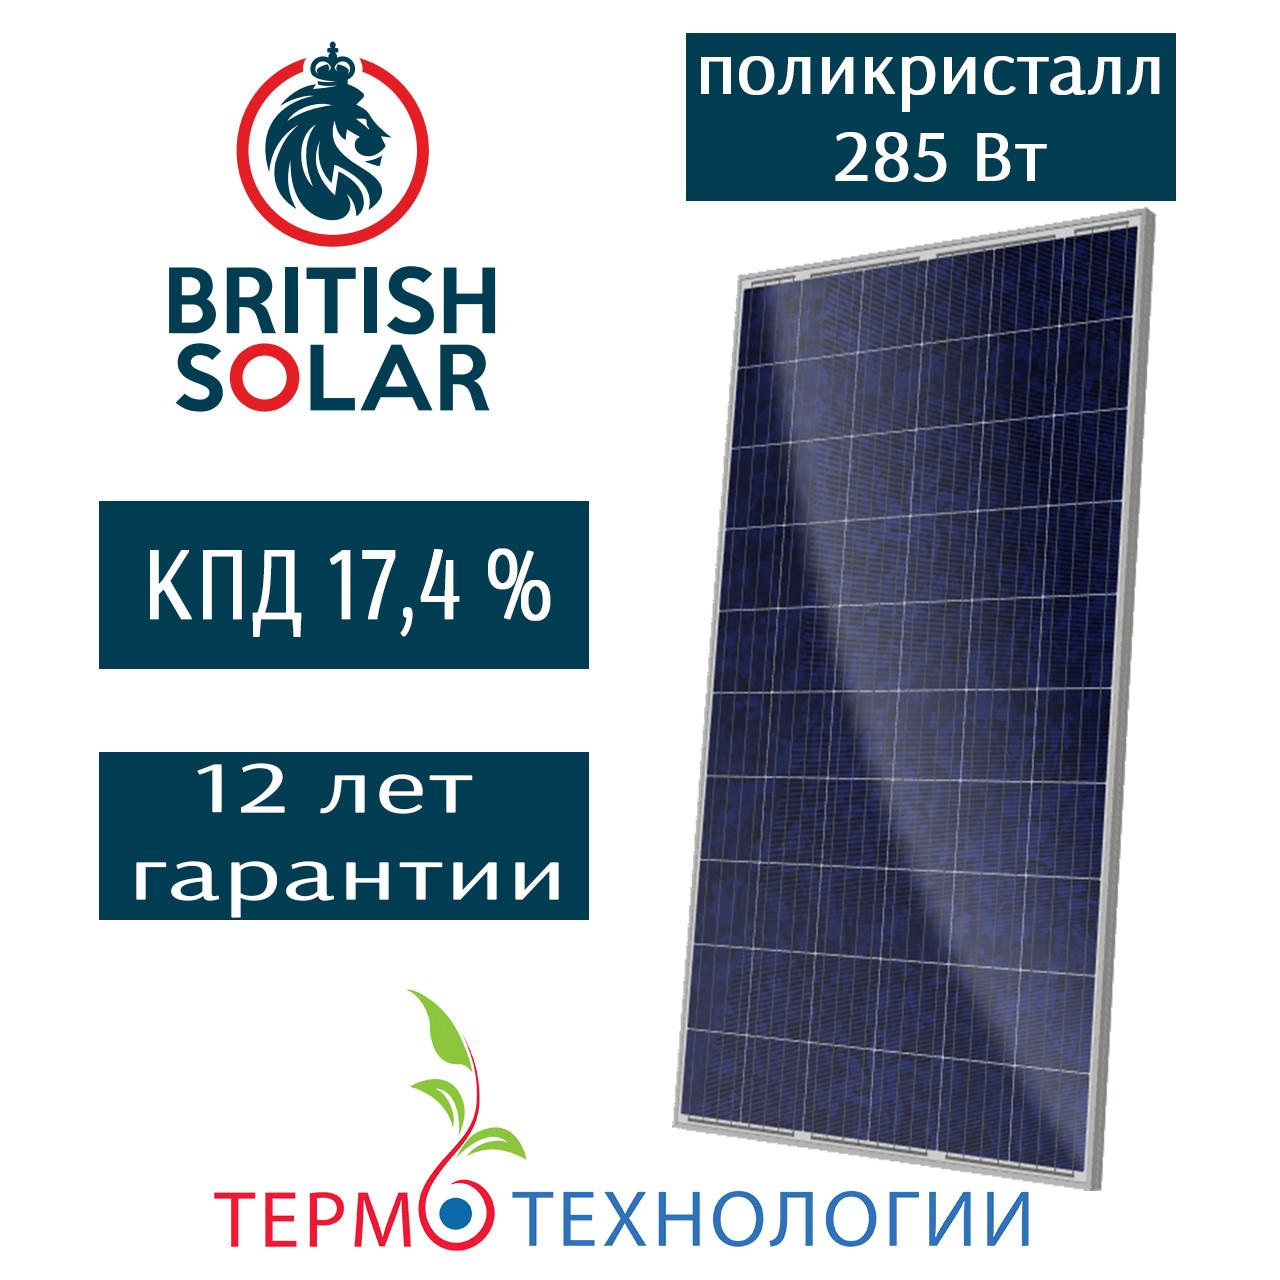 Солнечная батарея British solar 285 Вт, Poly